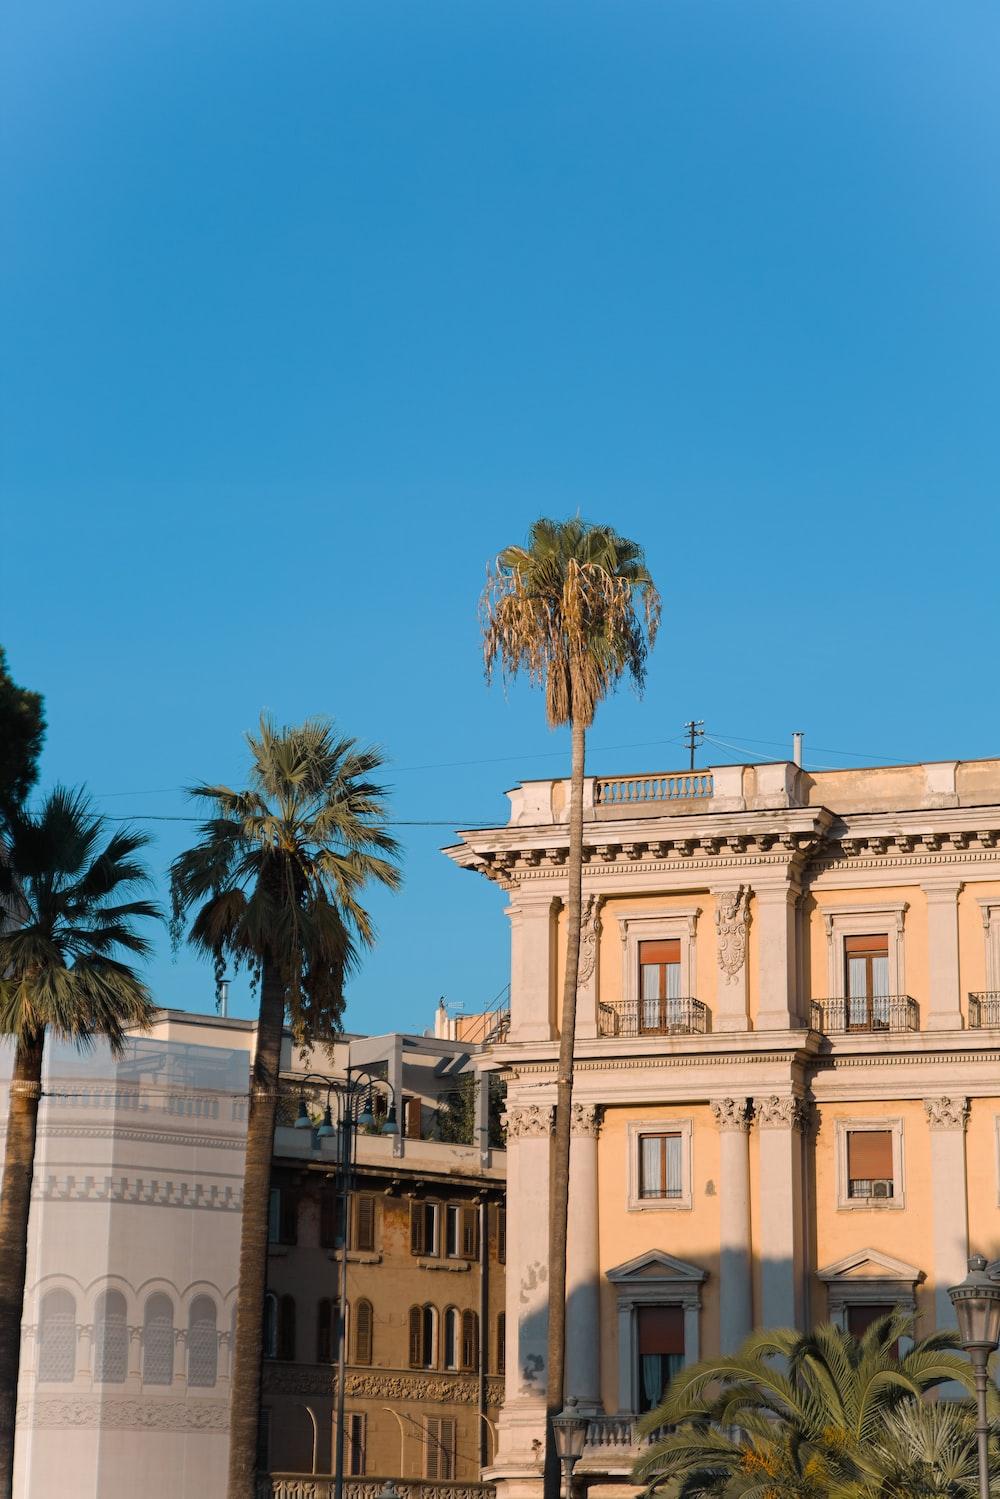 beige concrete building near palm tree under blue sky during daytime